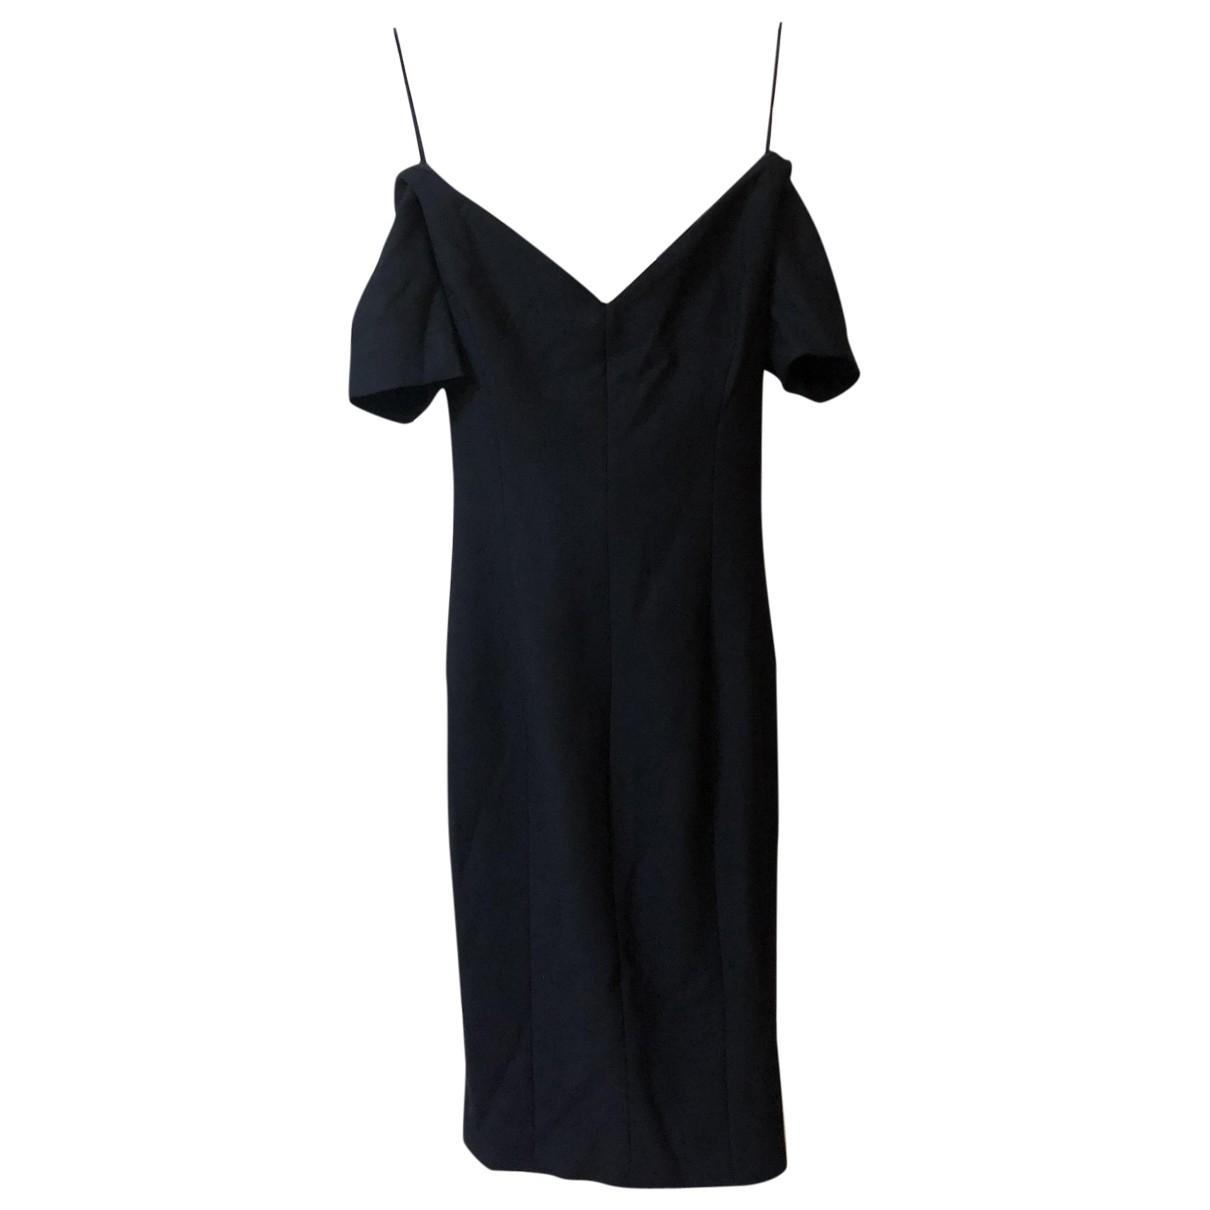 Elizabeth And James \N Kleid in  Schwarz Polyester